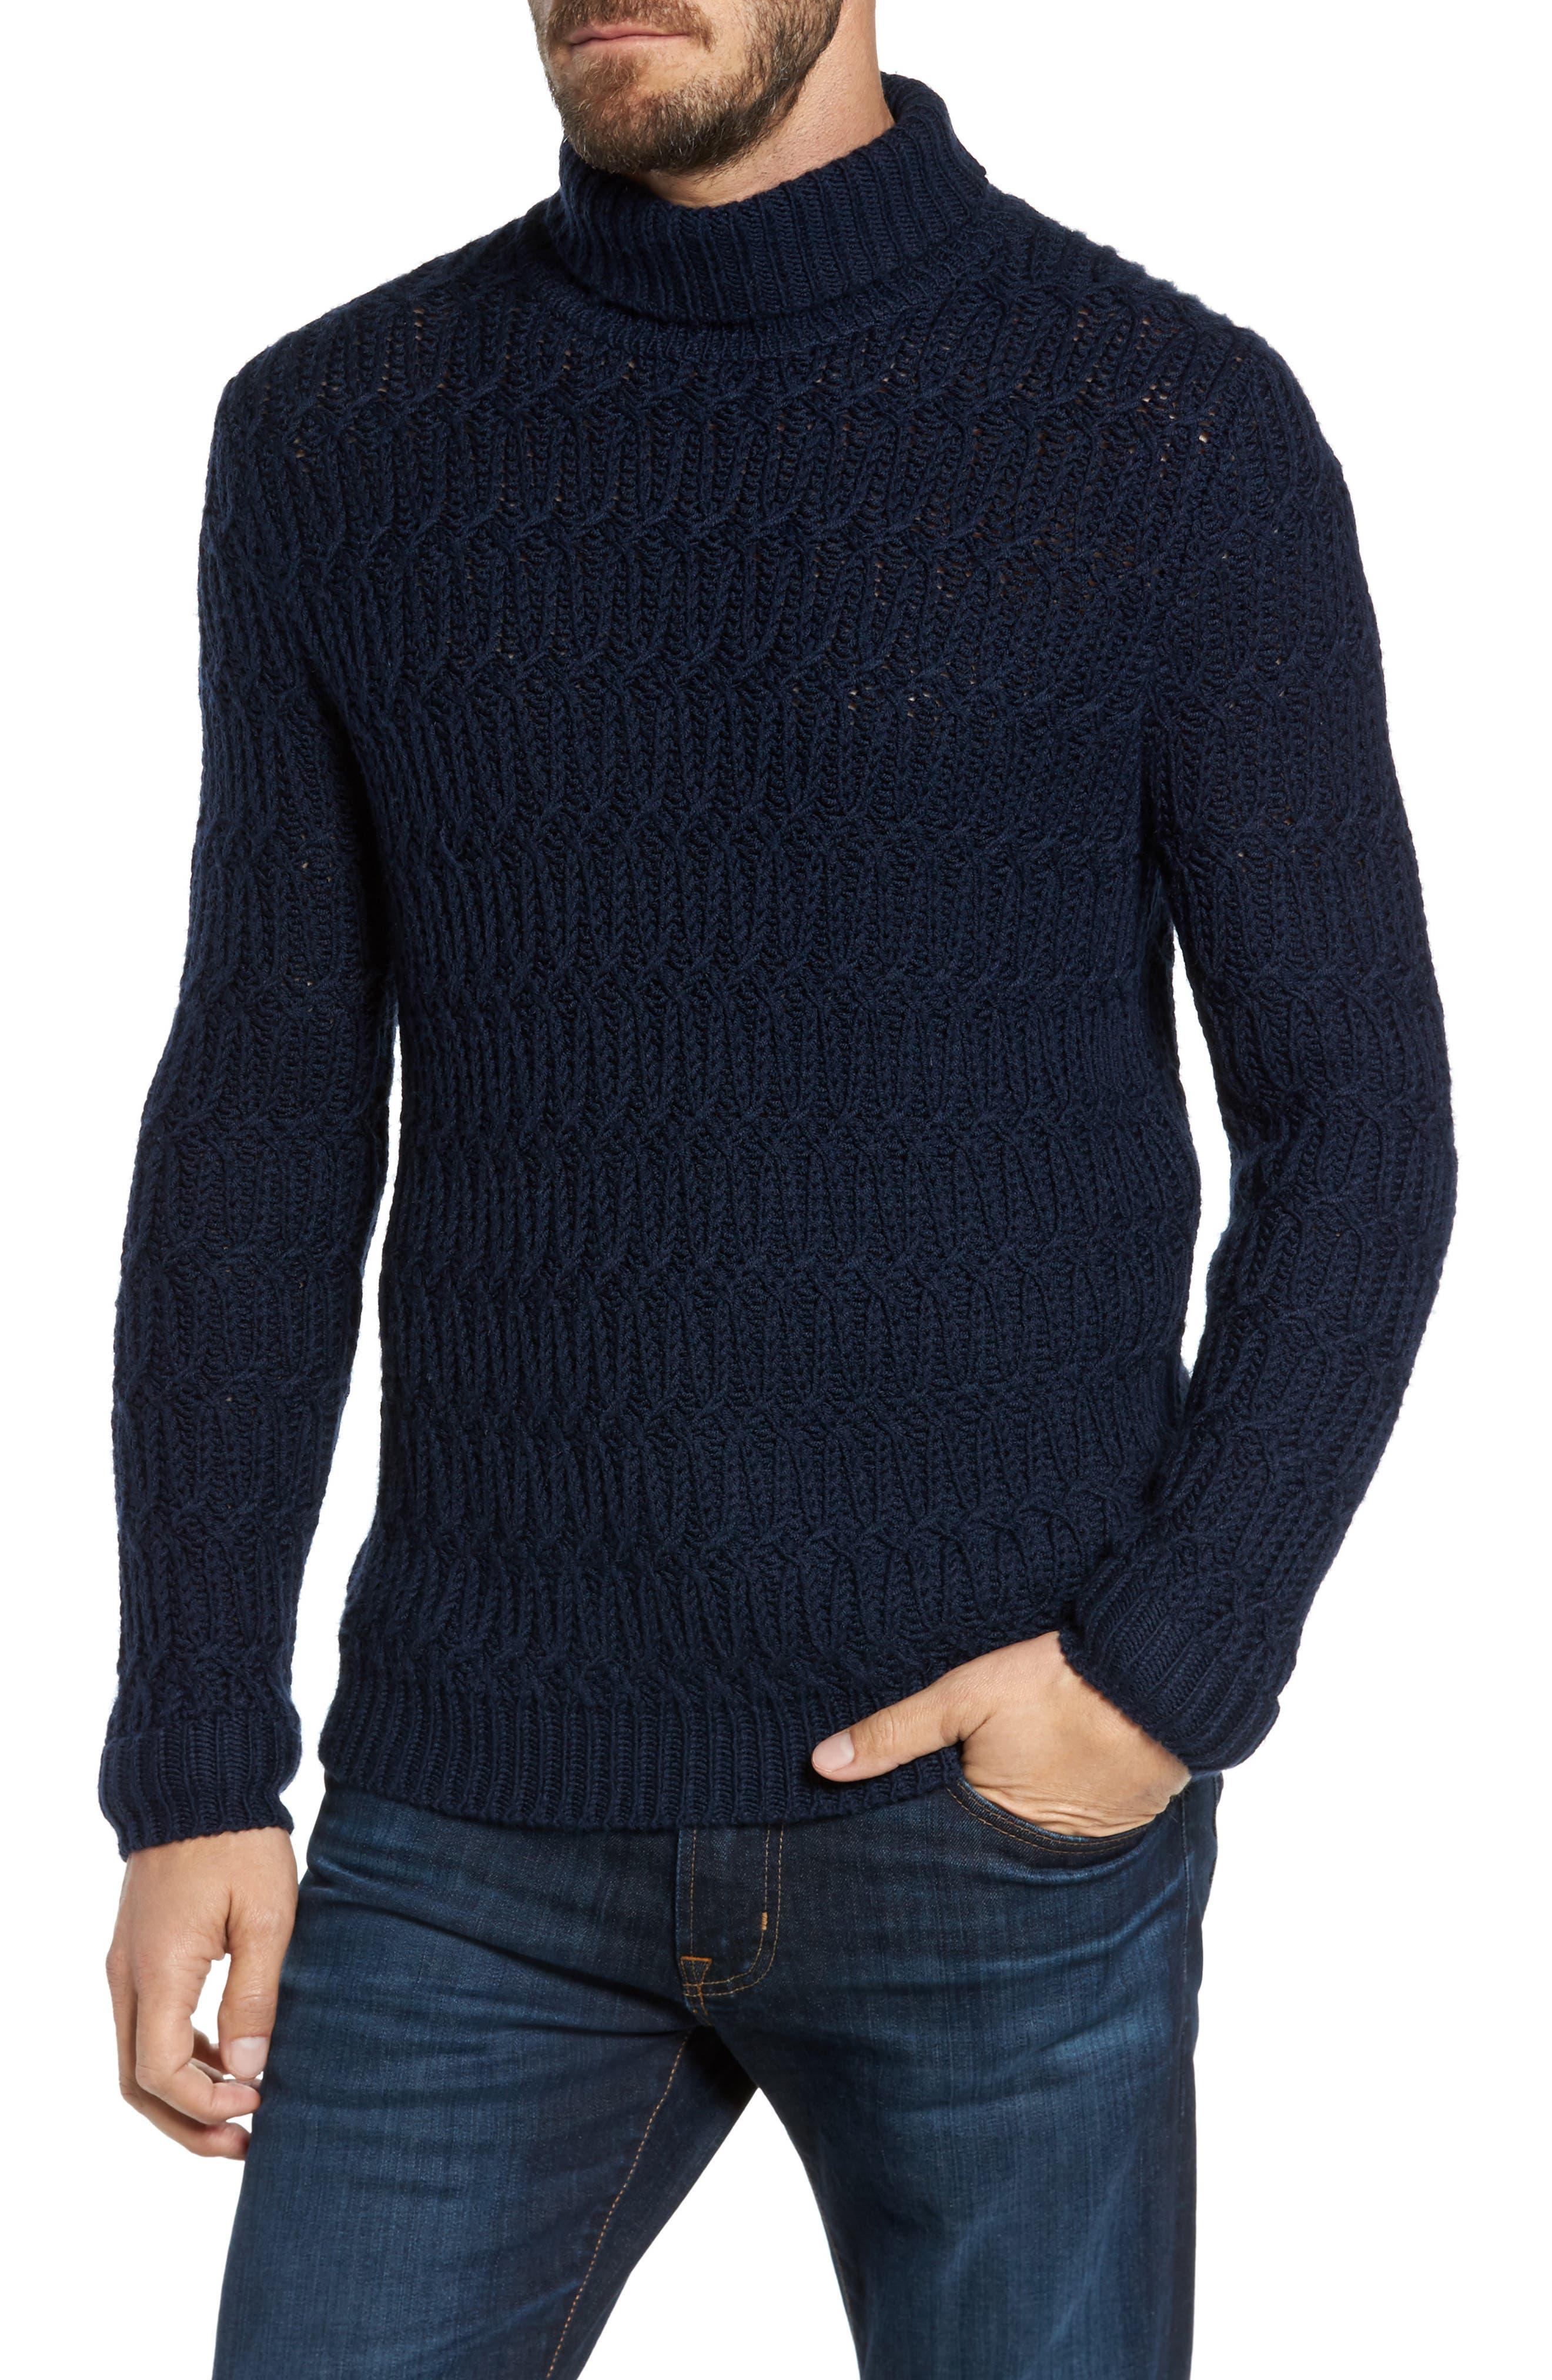 Chunky Turtleneck Sweater,                             Main thumbnail 1, color,                             Navy Iris